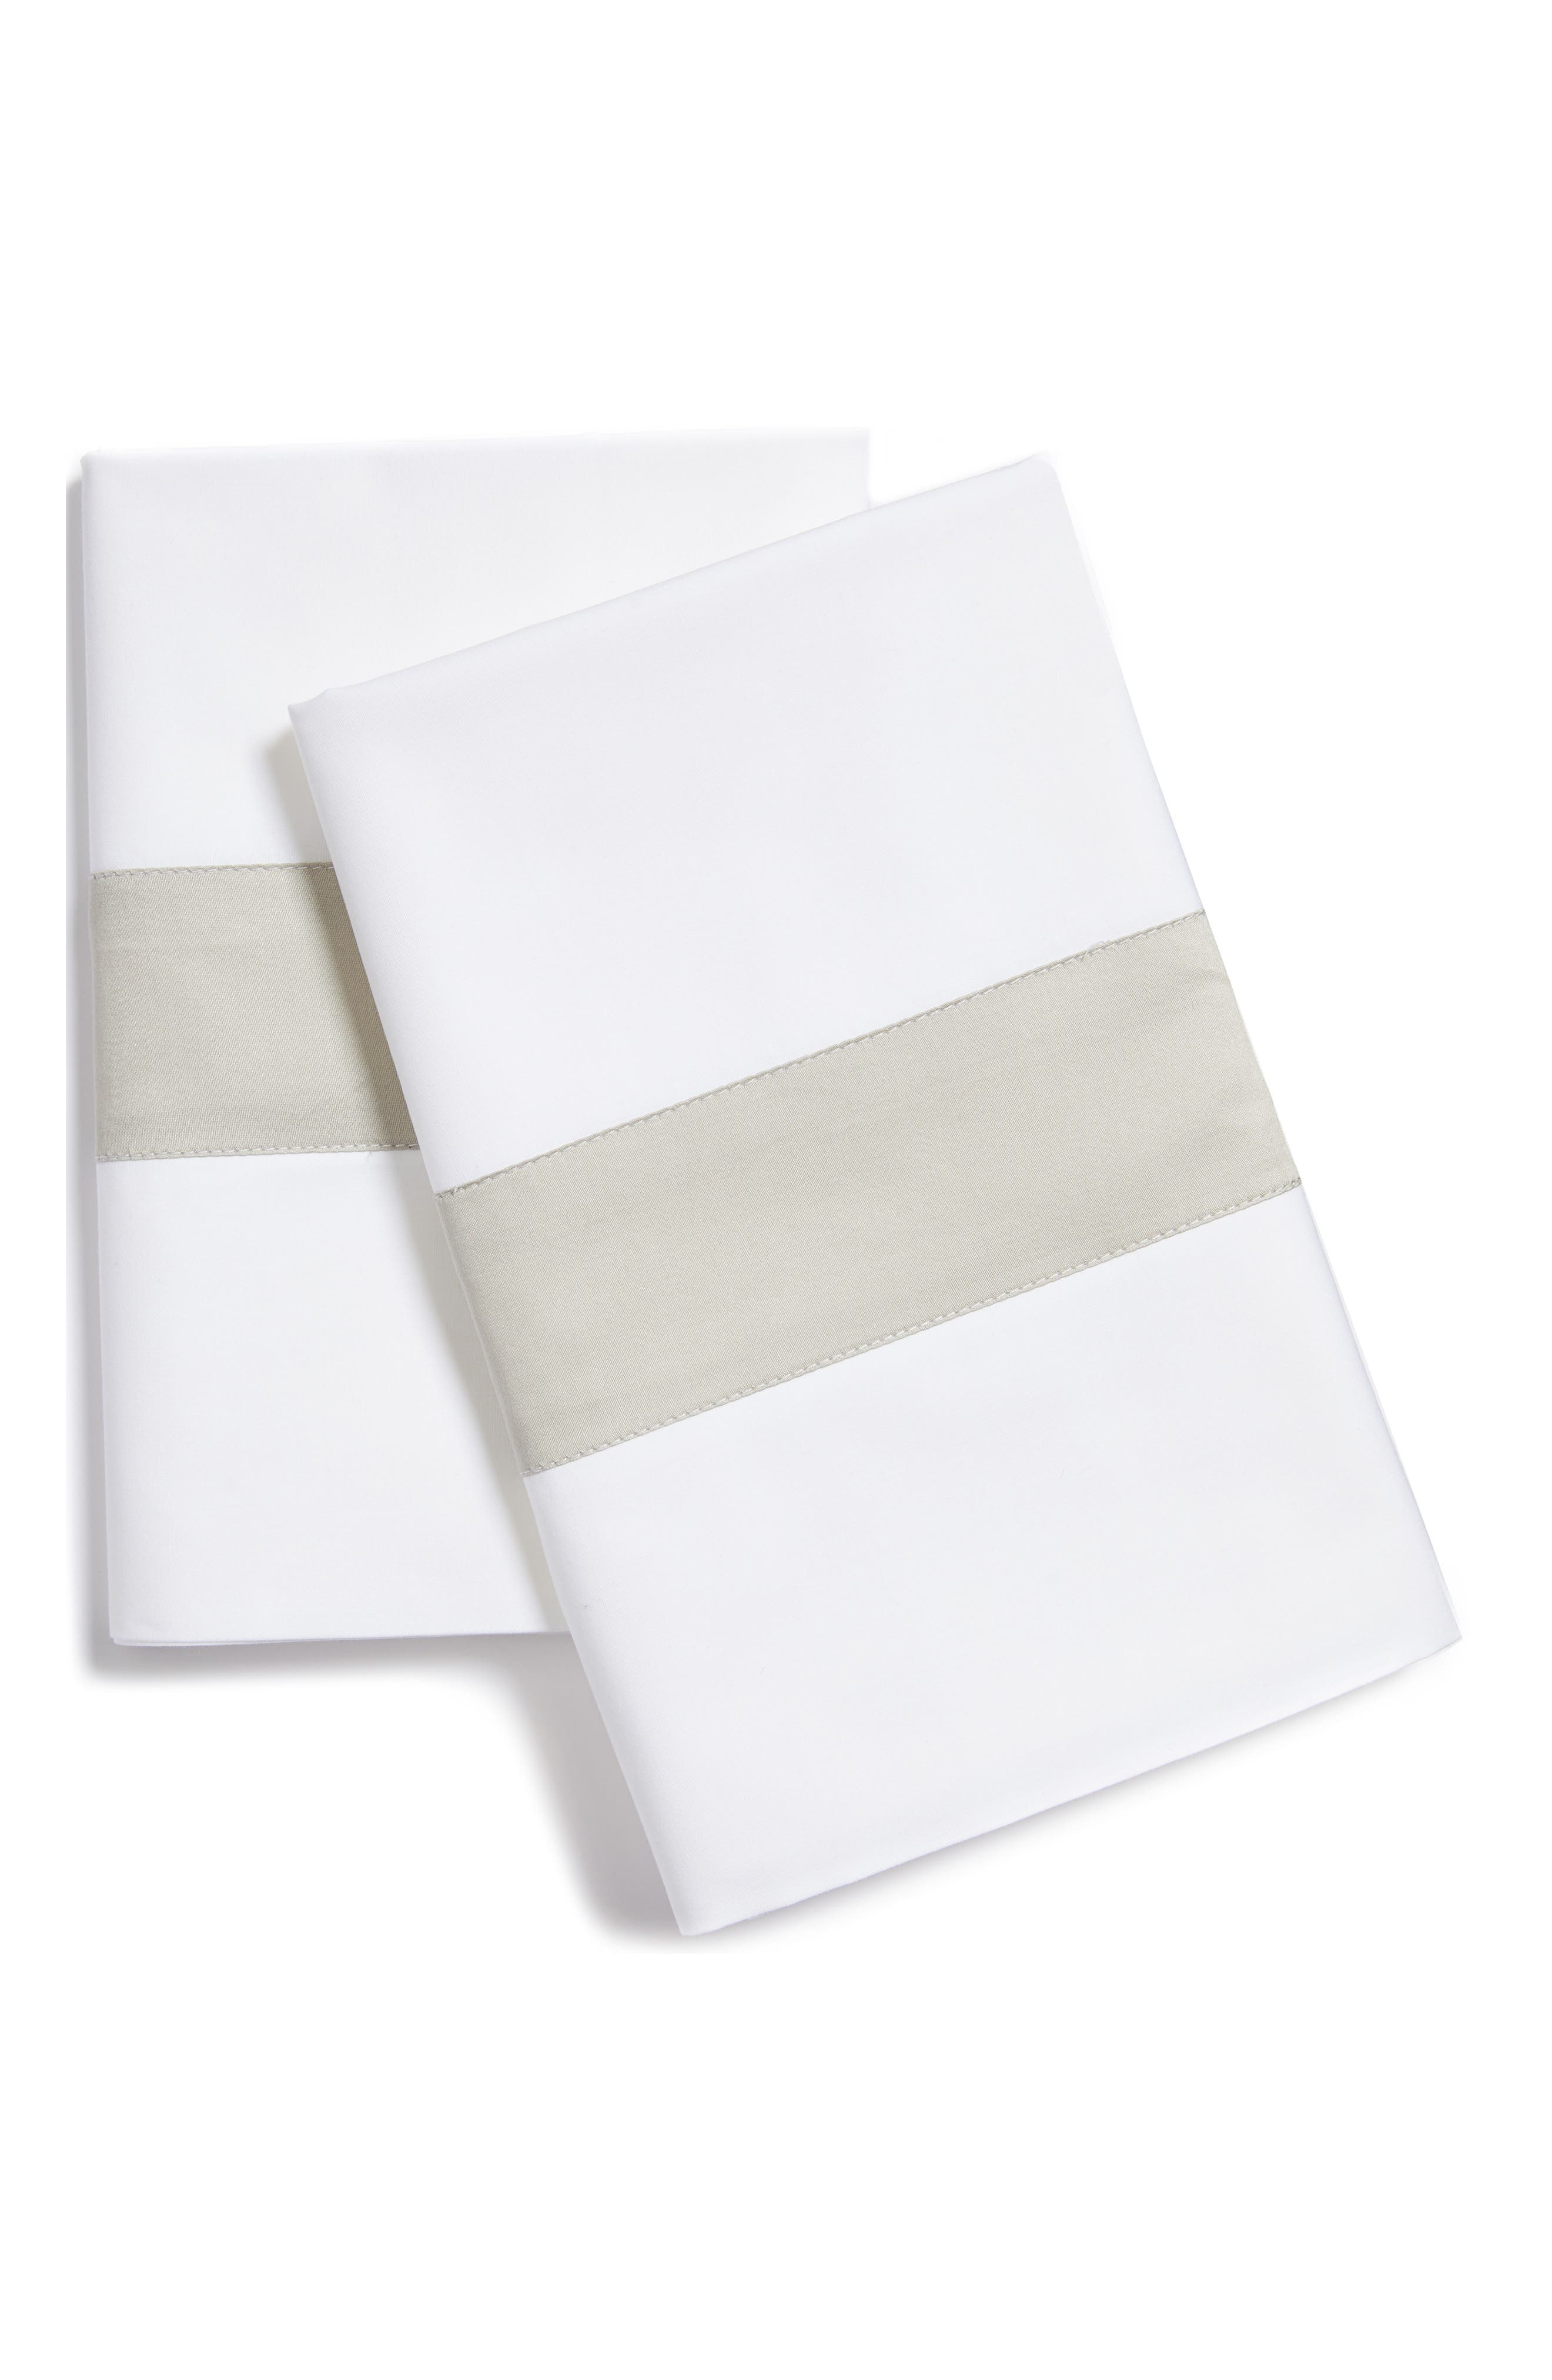 Alternate Image 1 Selected - SFERRA Orlo Pillowcase